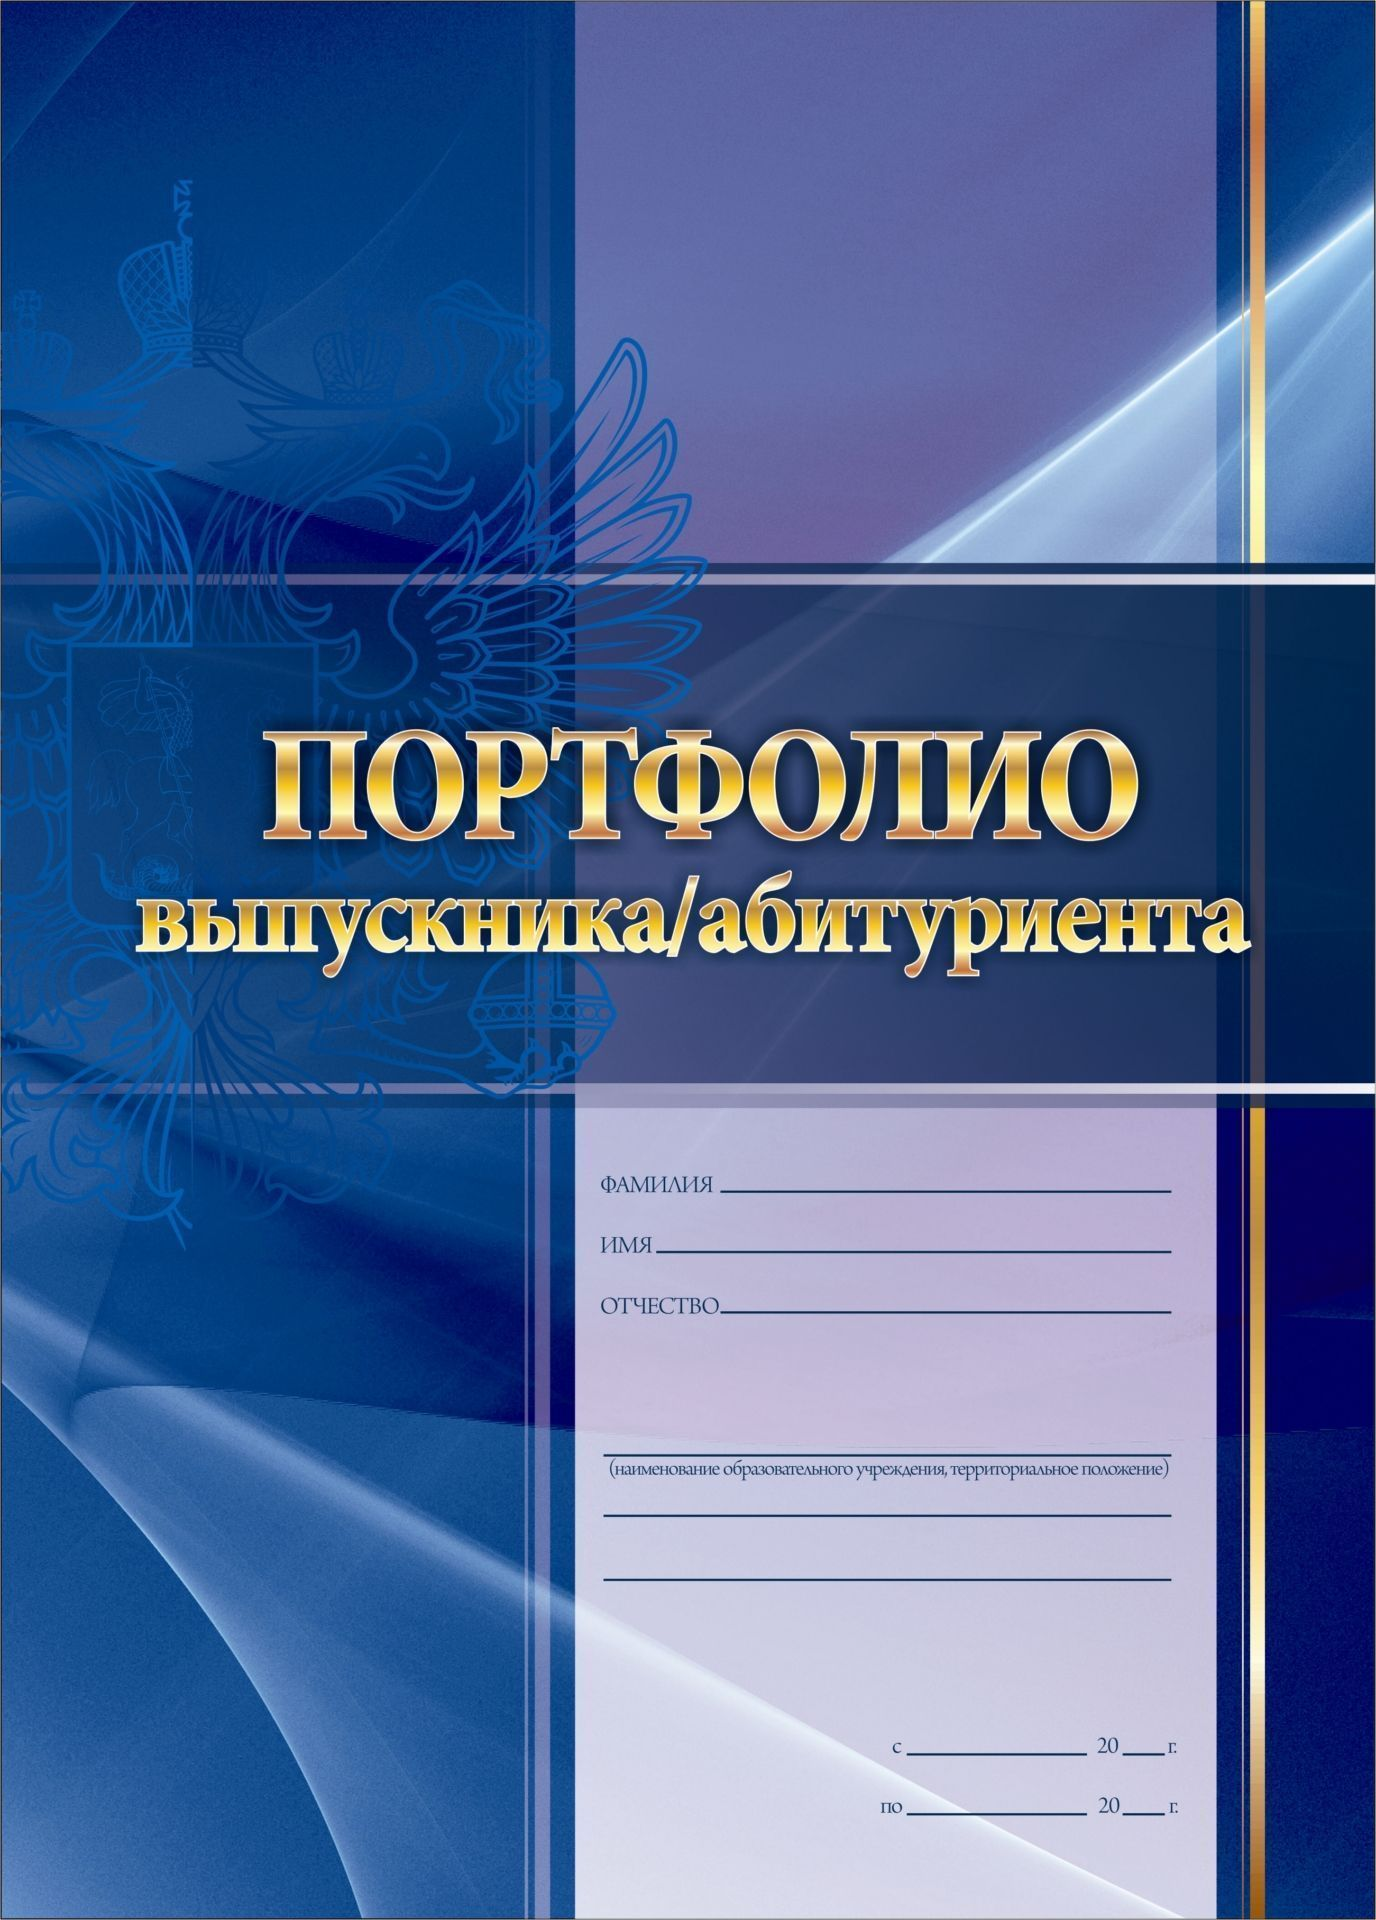 """Портфолио выпускника/абитуриента"": комплект для оформления портфолио"